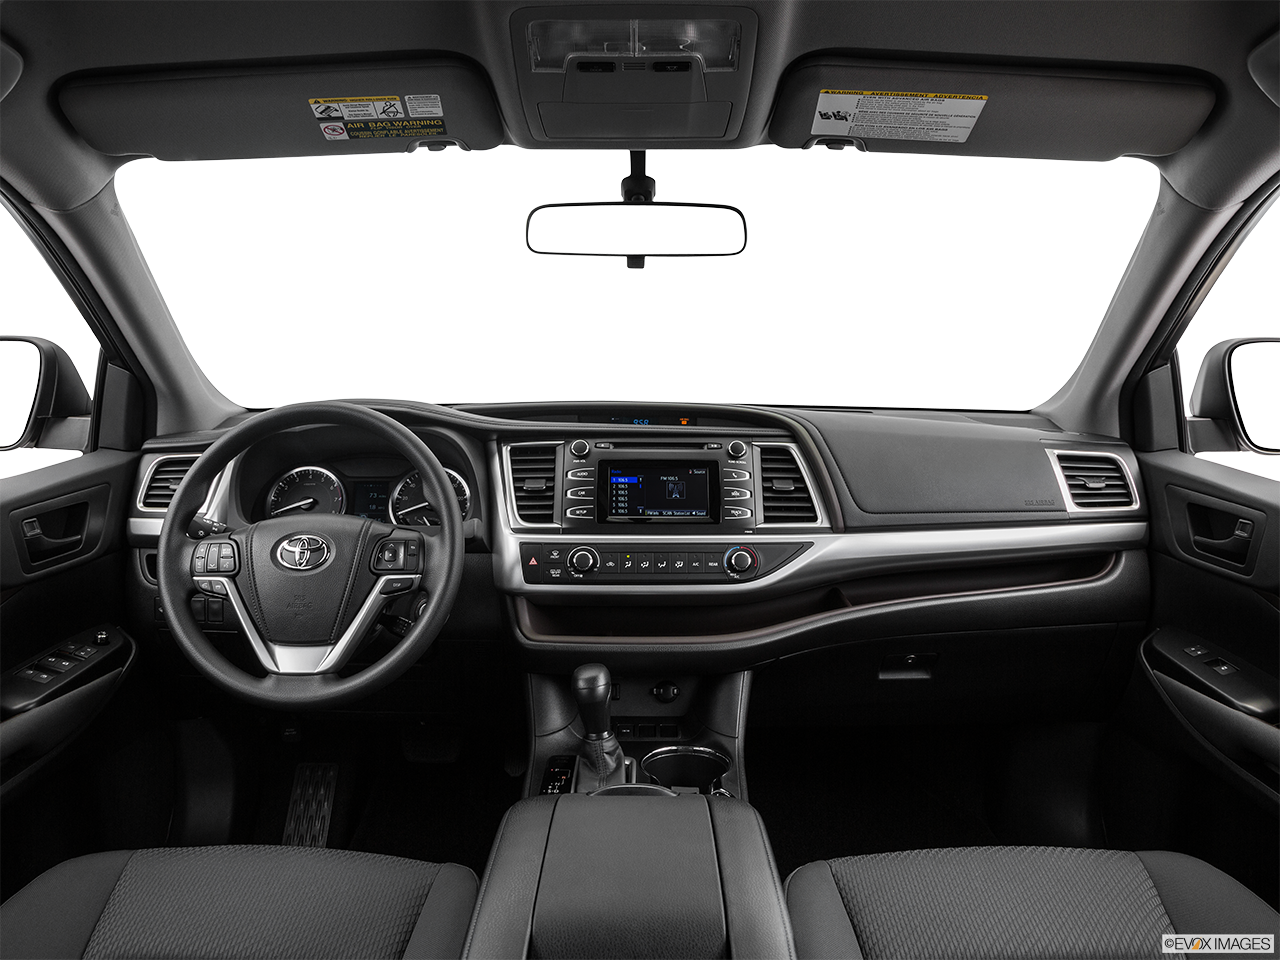 2015 toyota highlander hampton roads casey toyota casey toyota for Toyota highlander 2015 interior